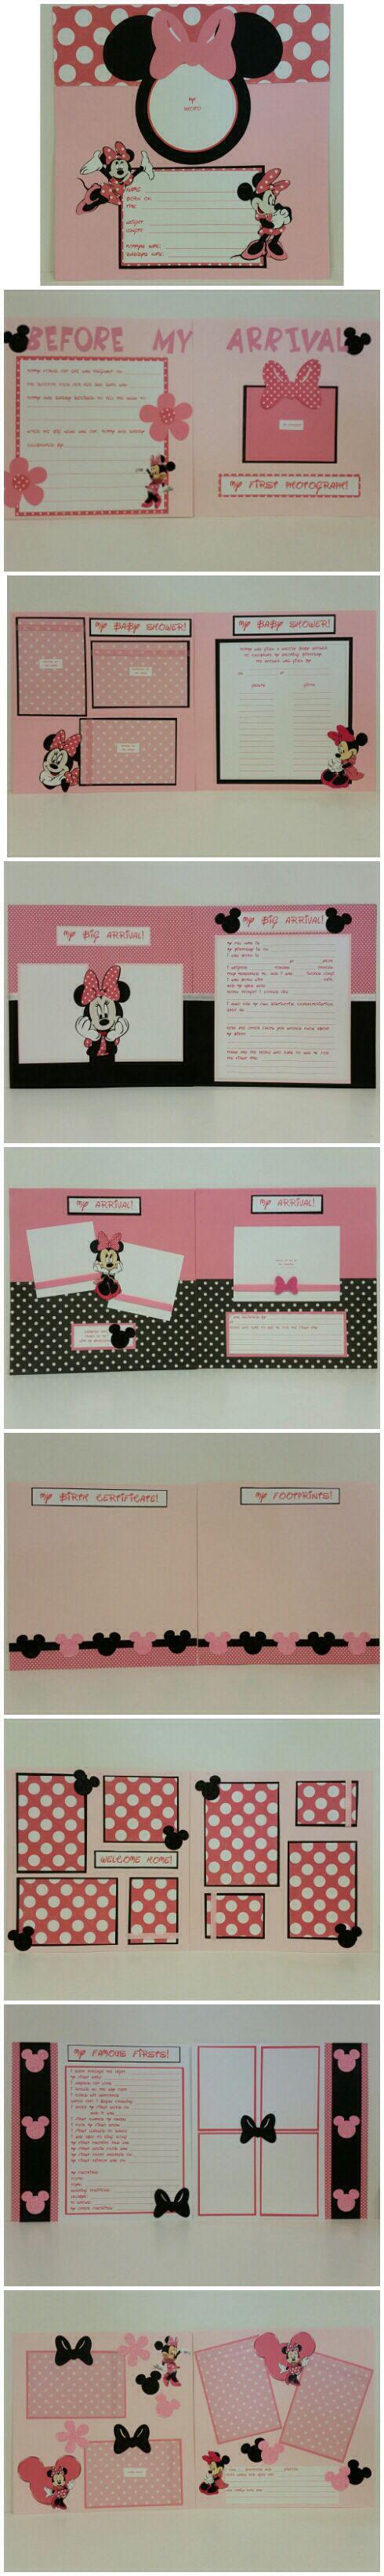 Mejores 13 imágenes de Minnie mouse en Pinterest | Cosas de disney ...